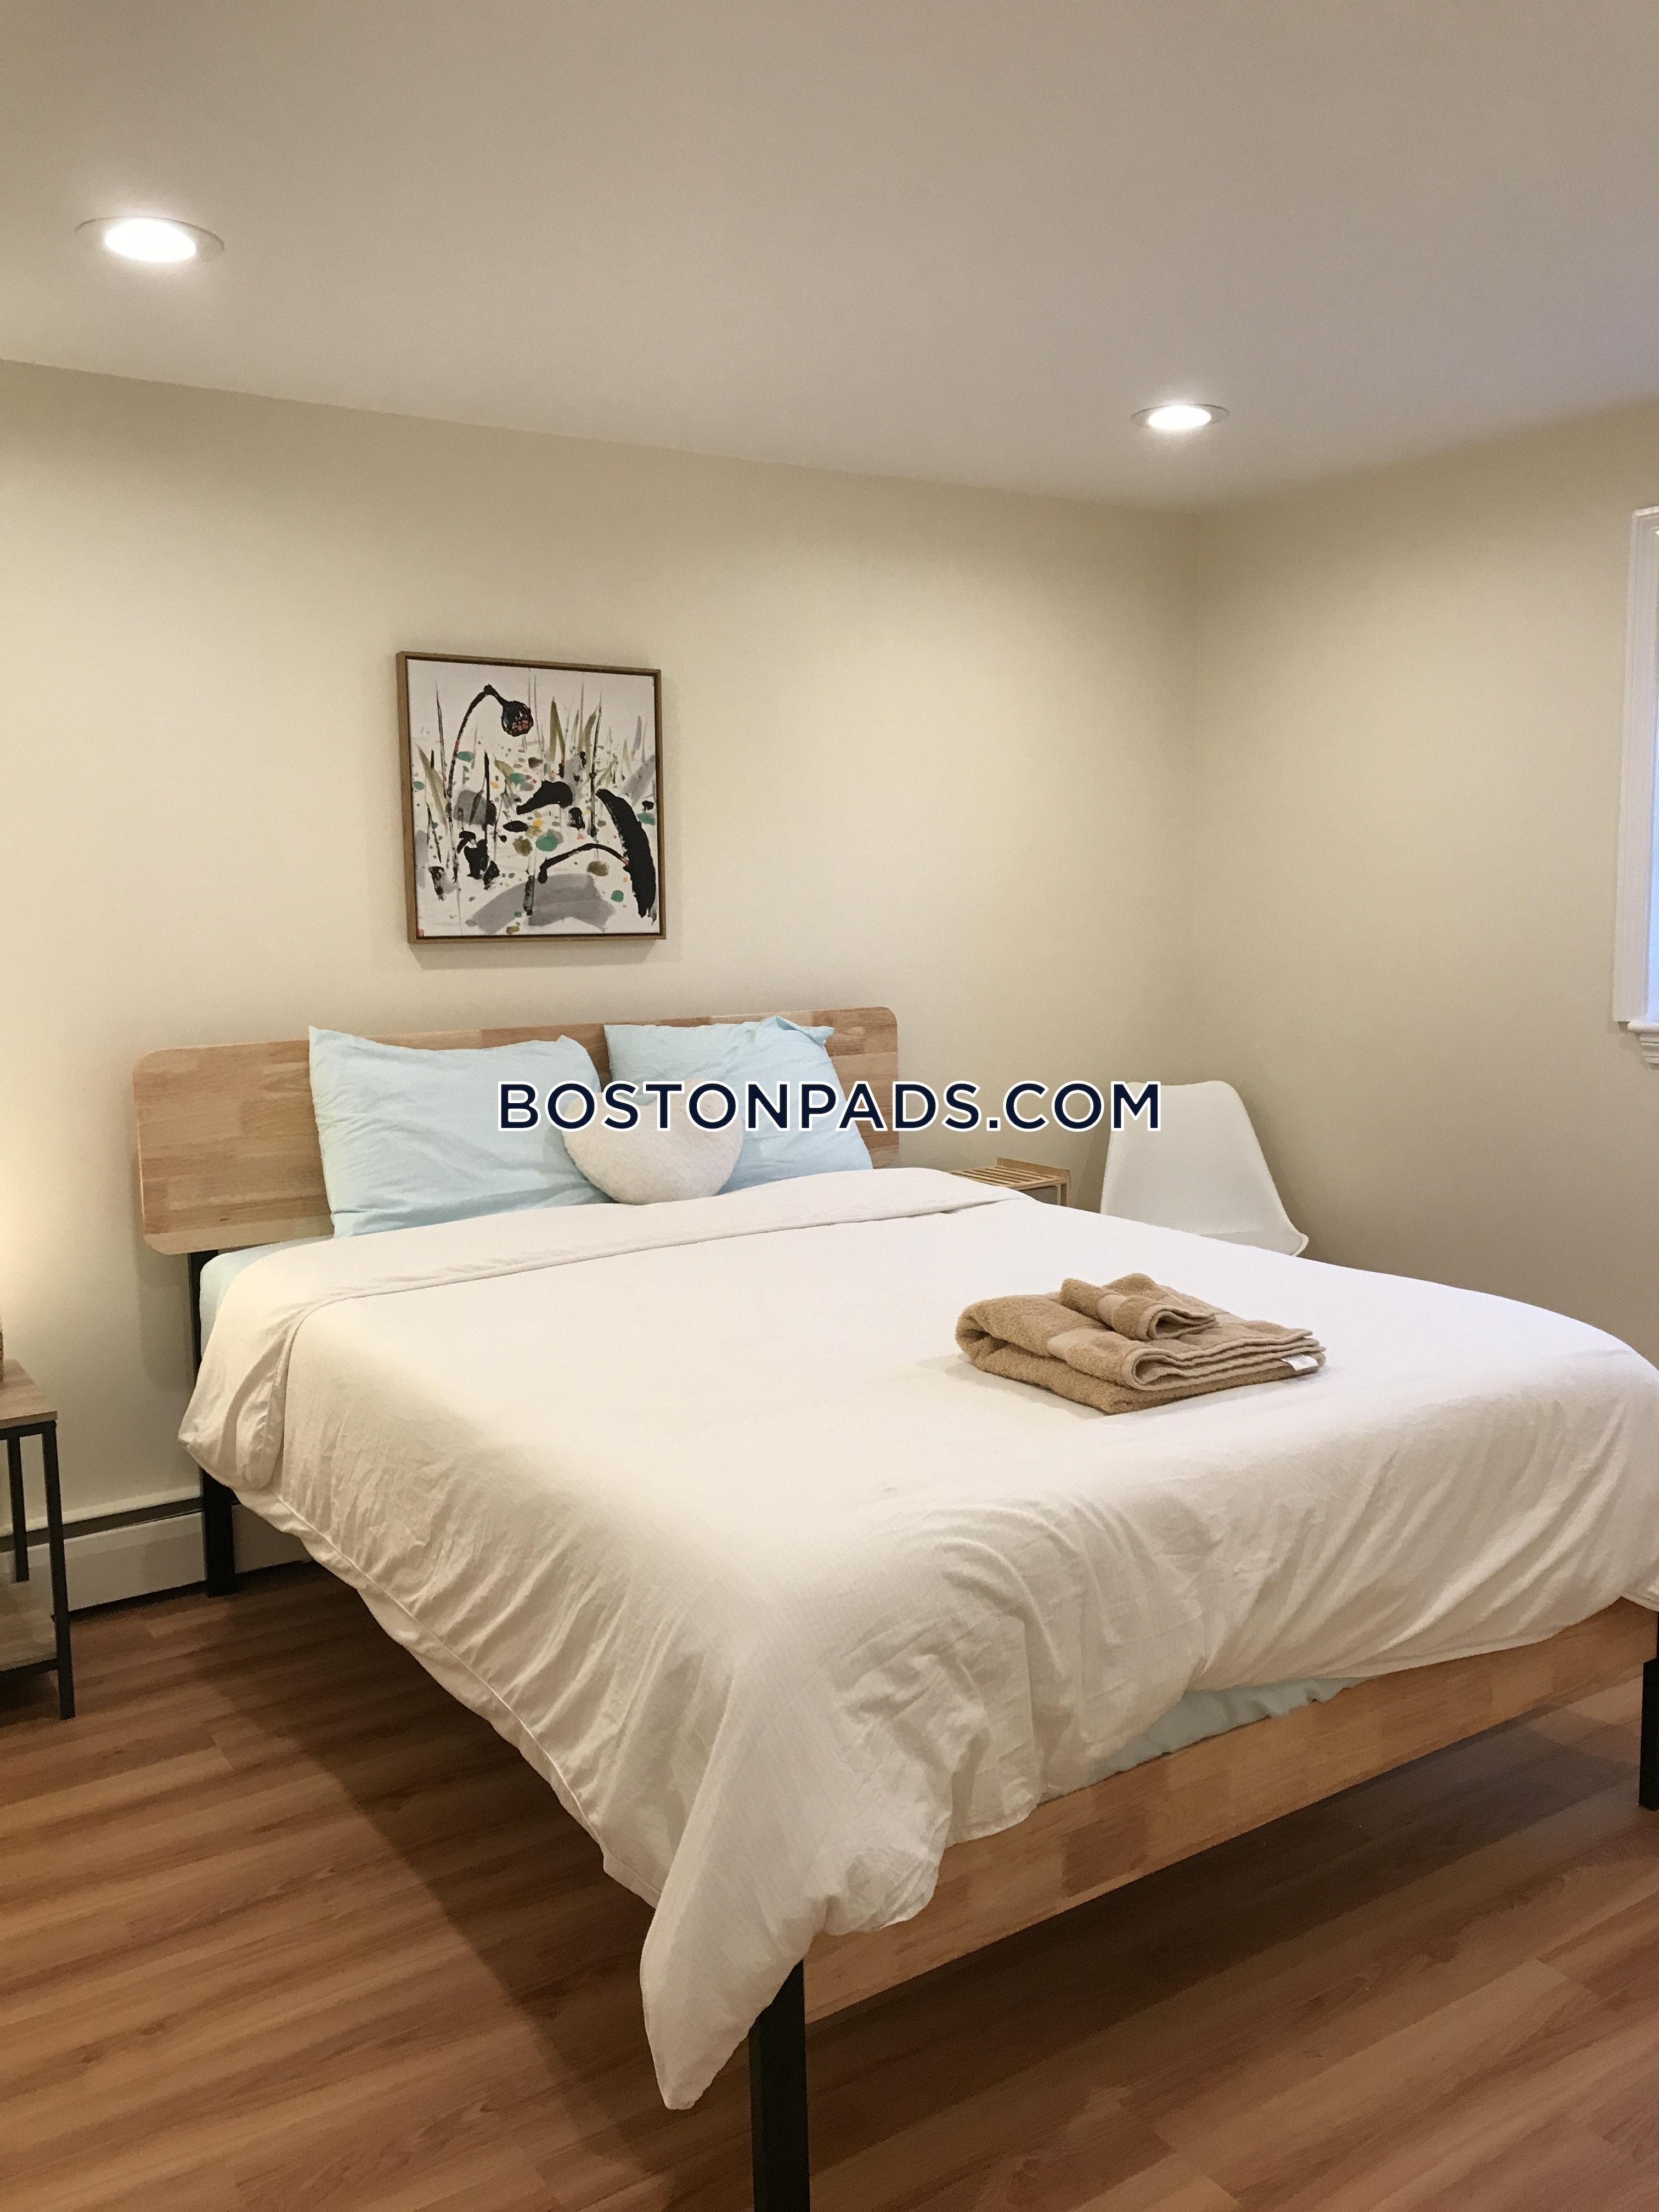 CAMBRIDGE - MT. AUBURN/BRATTLE/ FRESH POND - $2,250